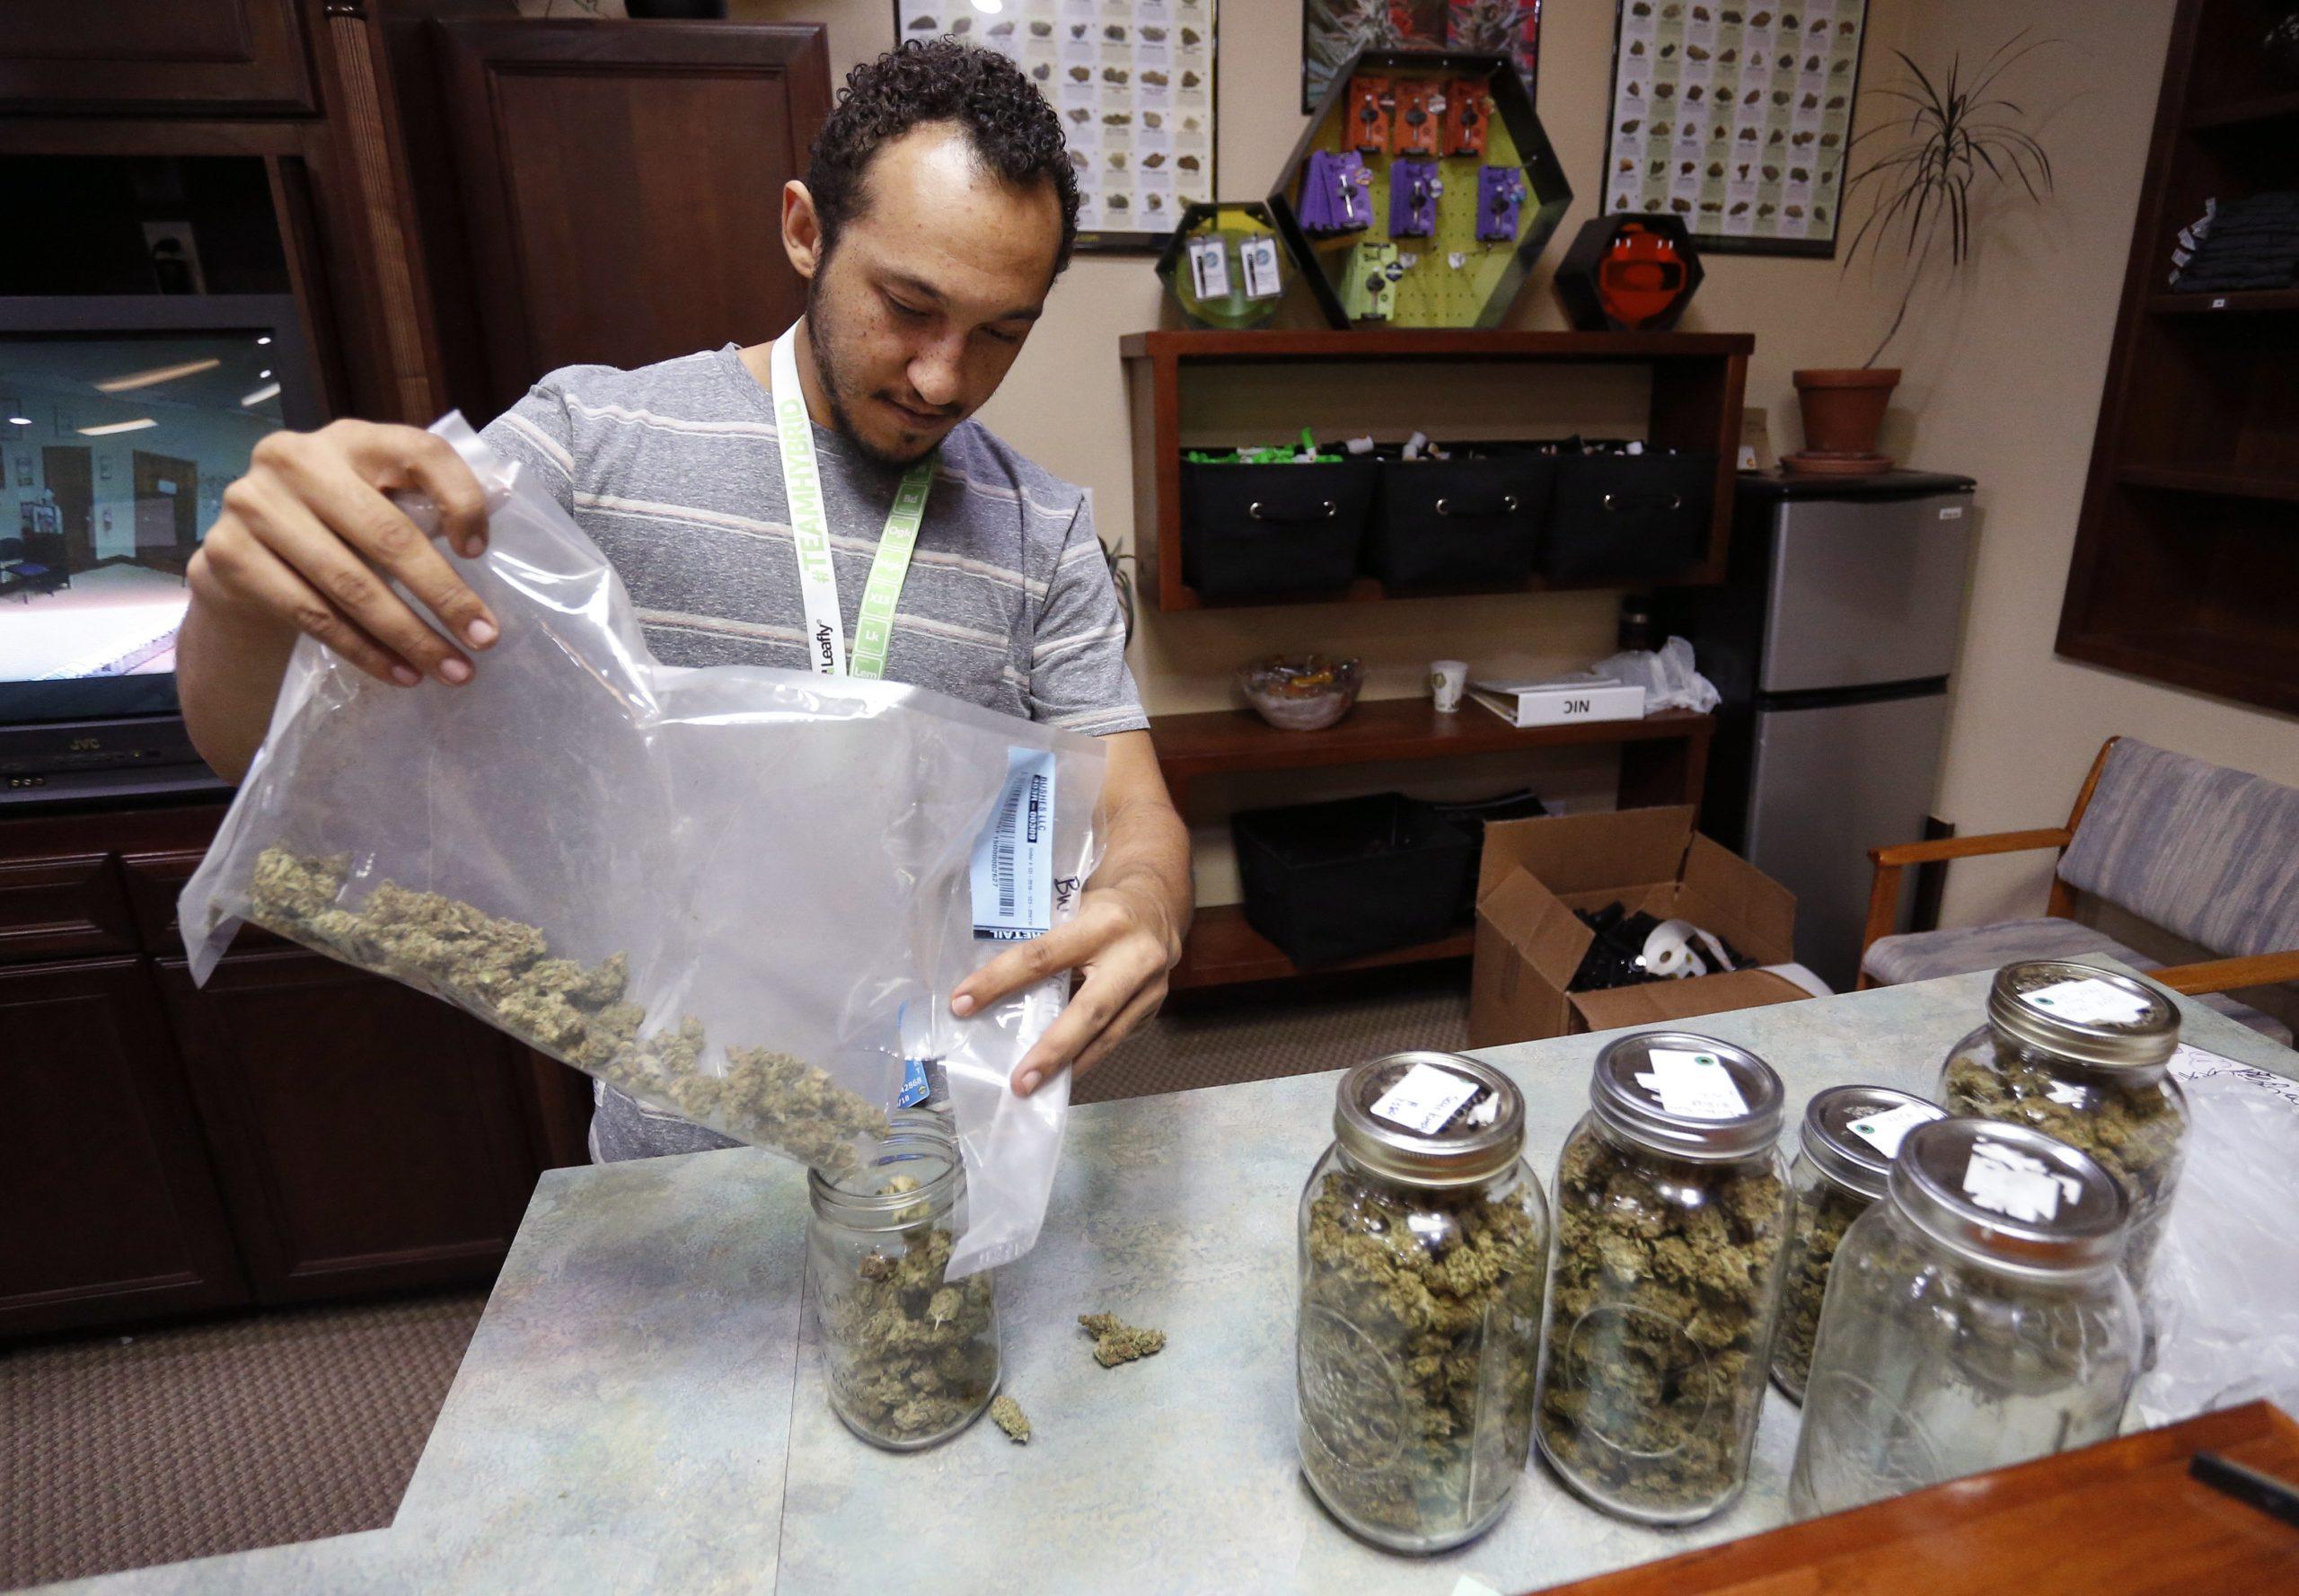 Chronic Pain Tops The Reasons Patients Seek Medical Marijuana